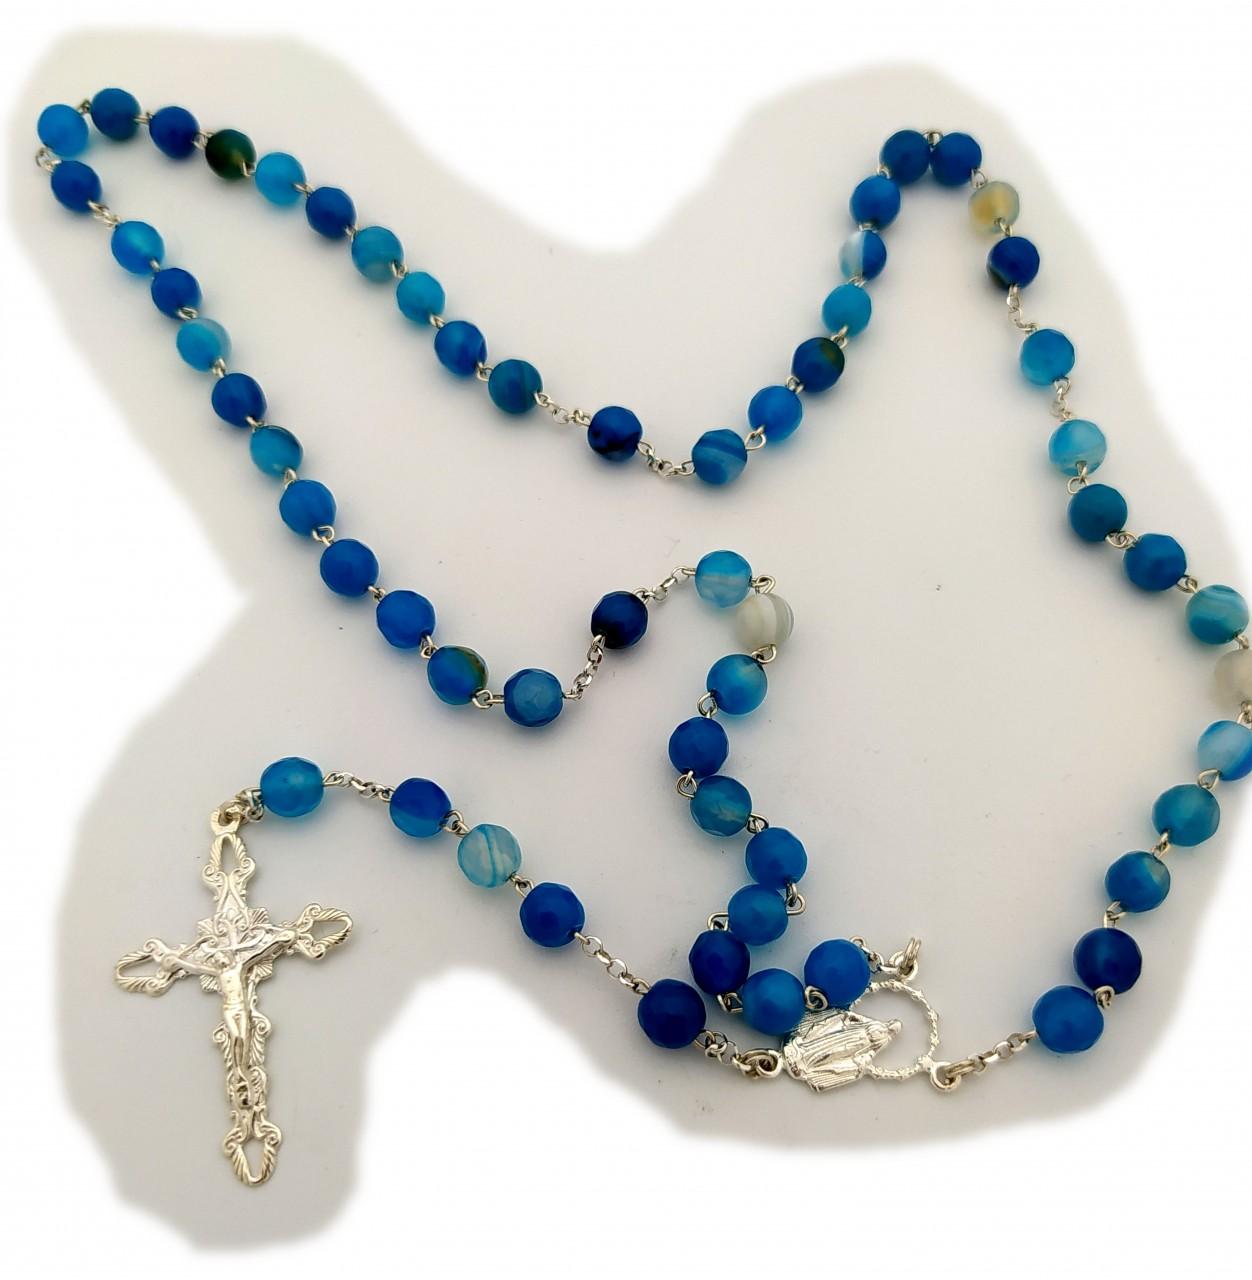 Halskette Rosenkranz Kreuz Jesus Silber 925 Sterlingsilber Achat Blau Kugel